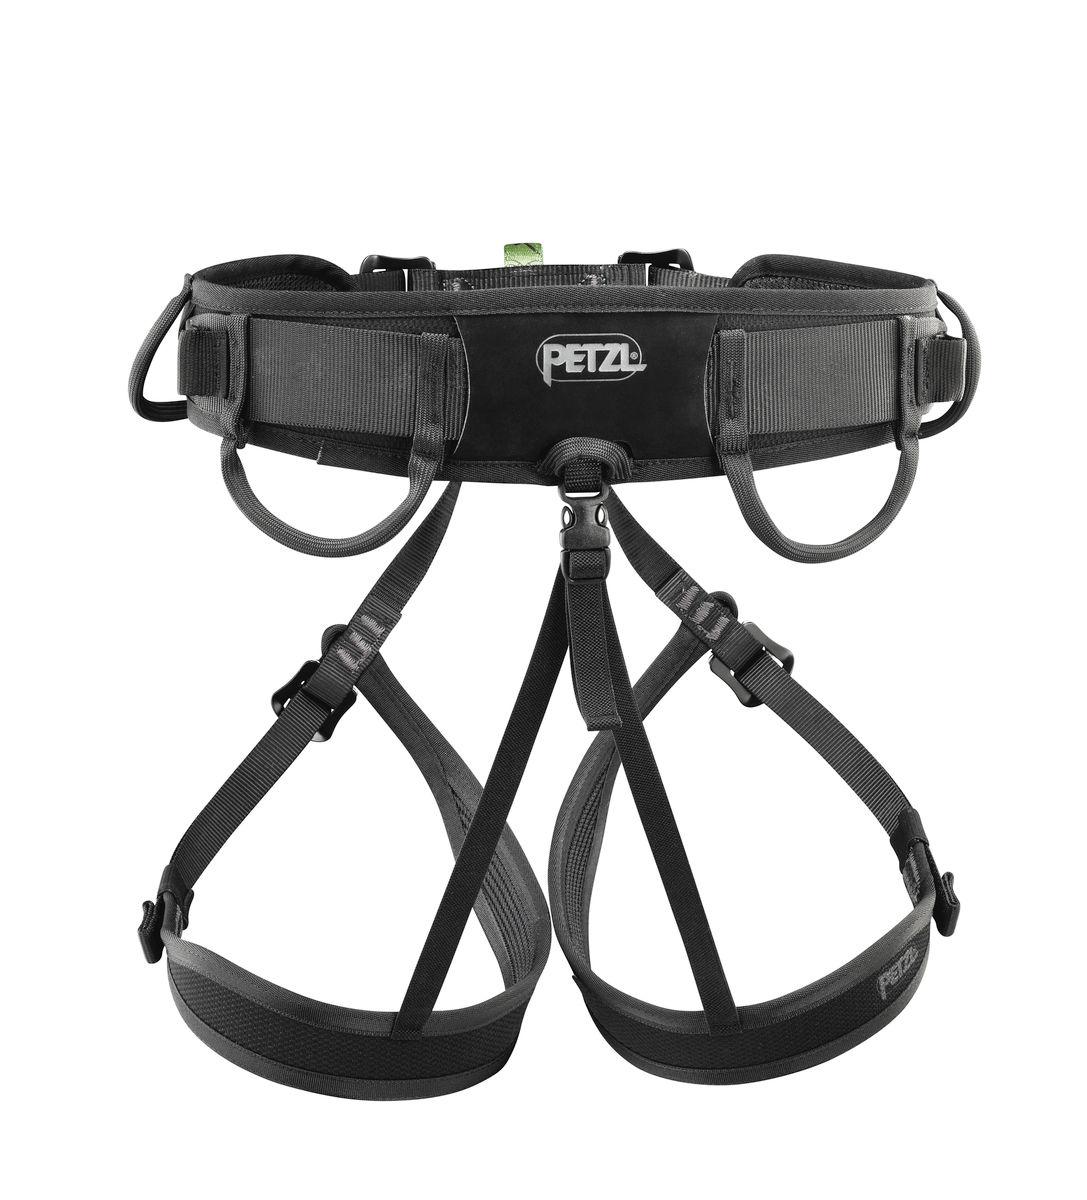 Petzl ASPIC Seat Harness